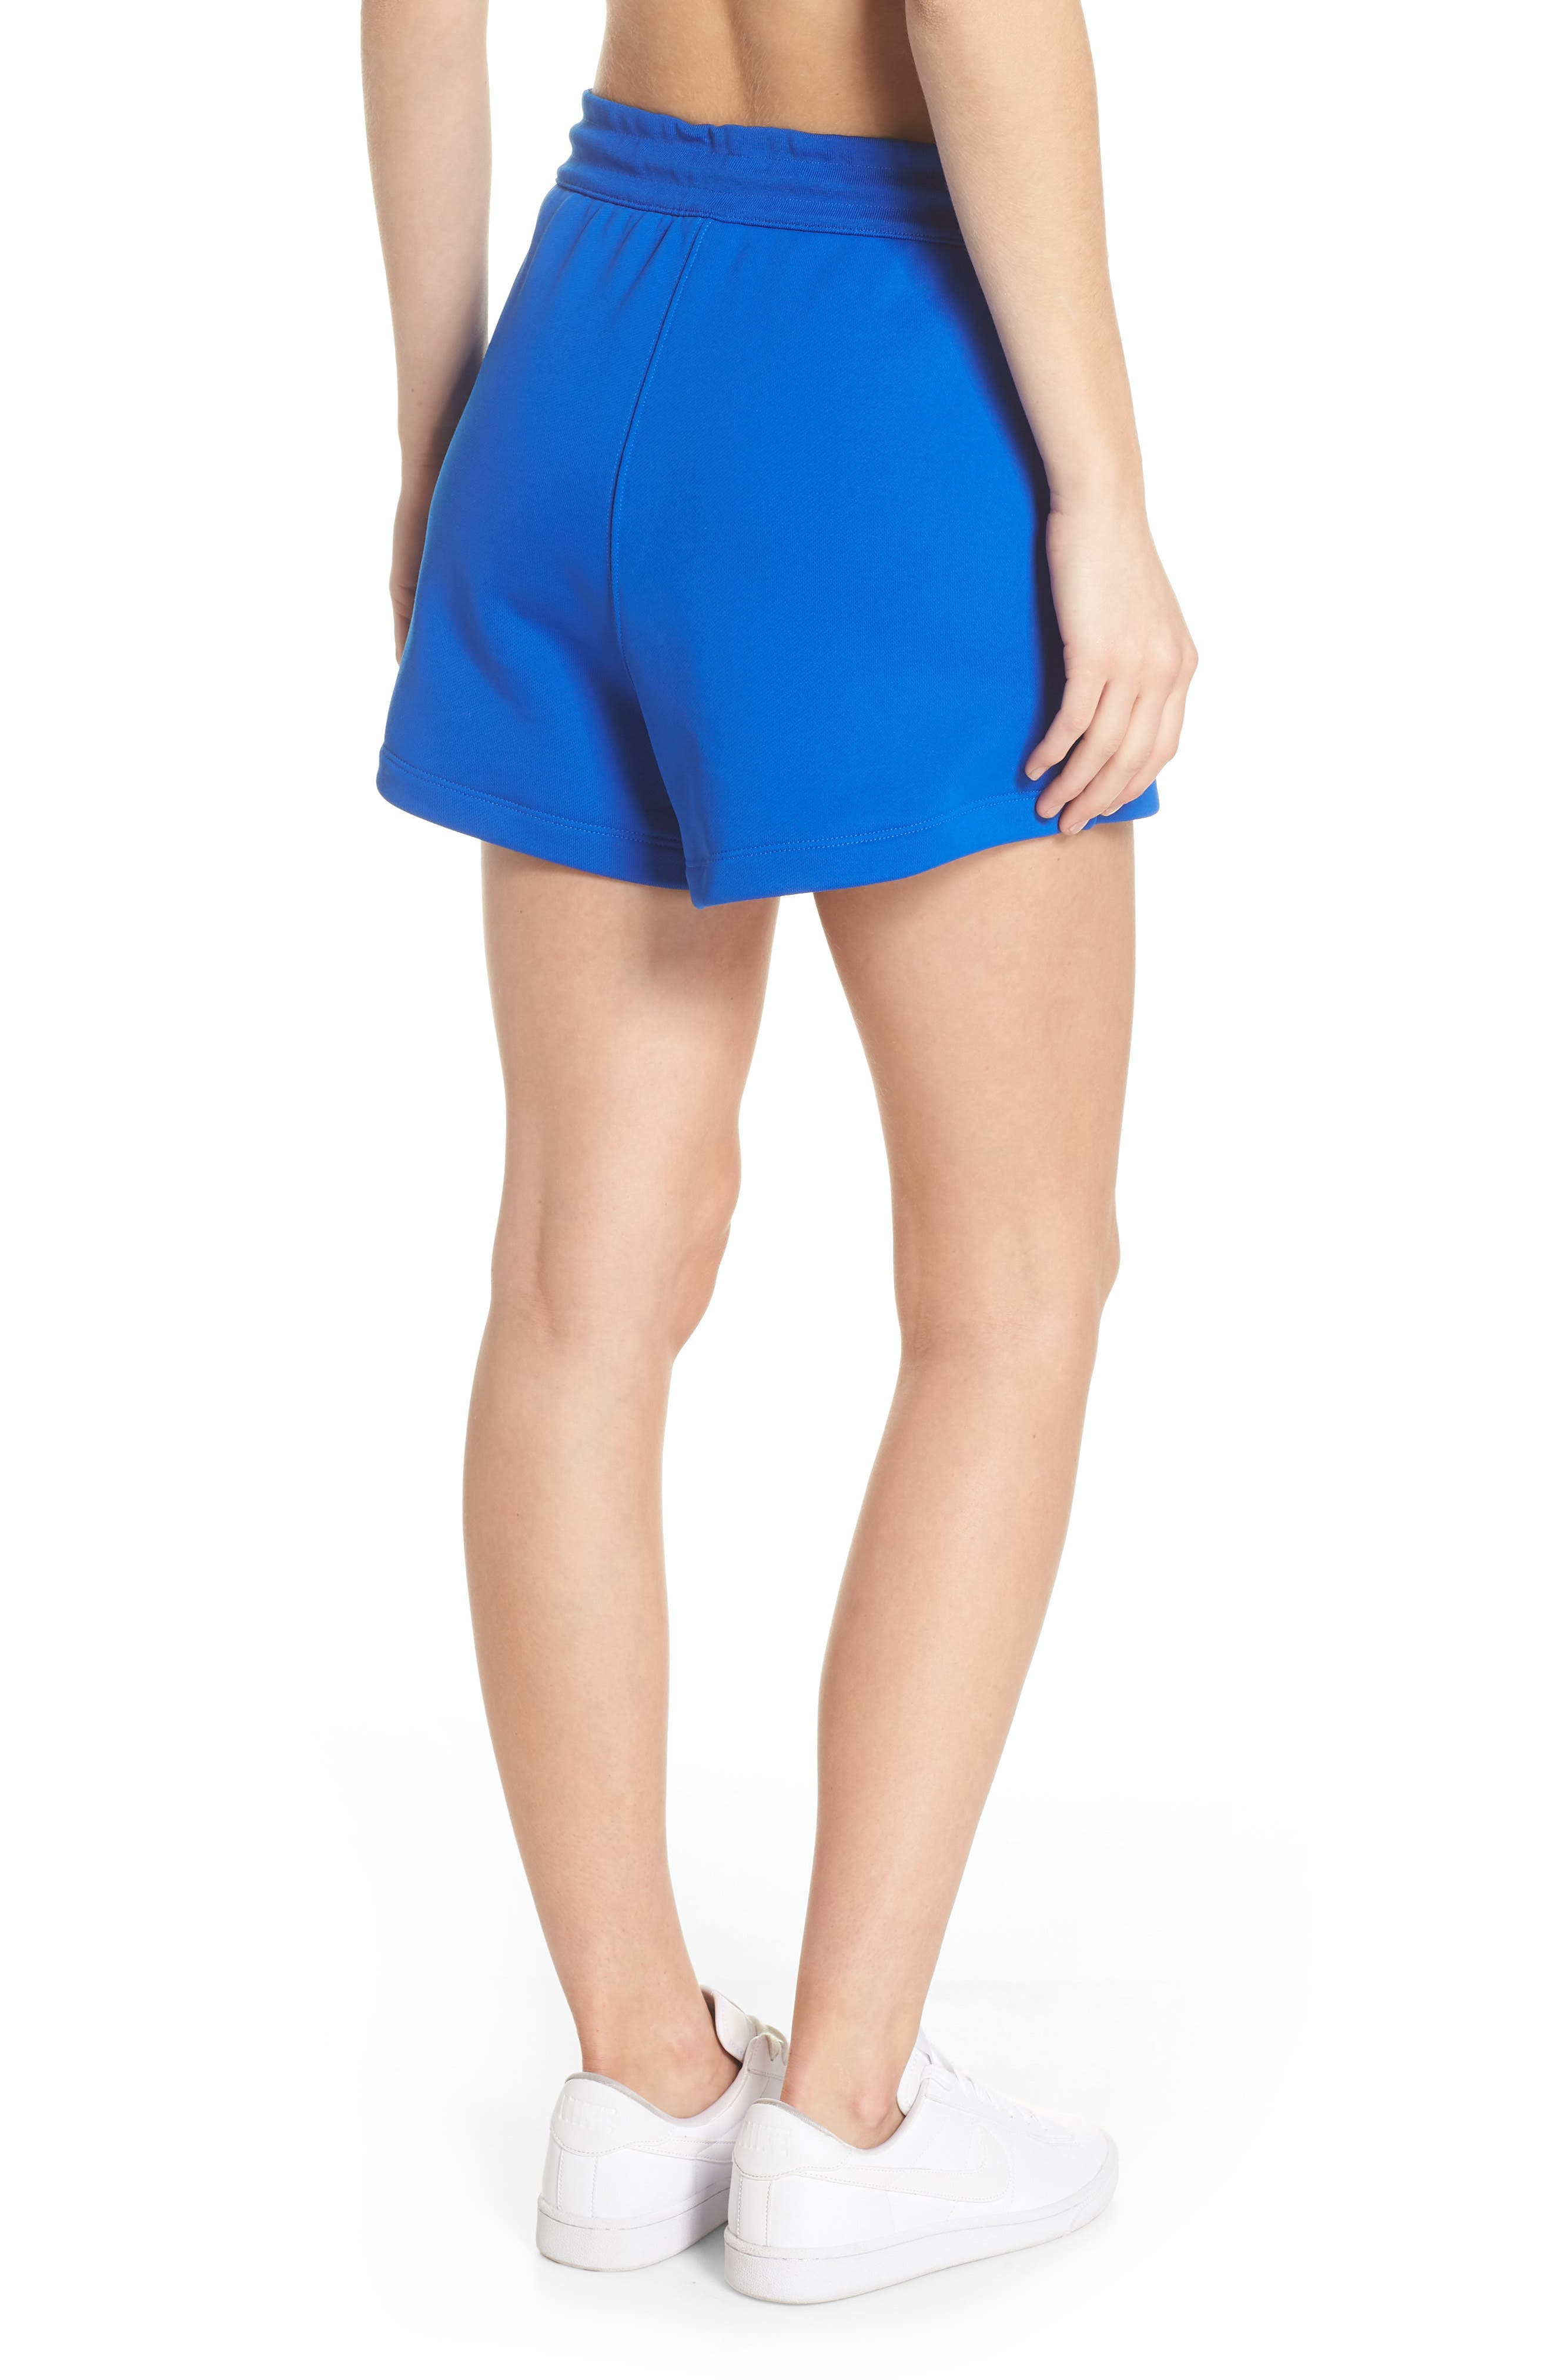 NikeLab Collection Women's Fleece Shorts,                             Alternate thumbnail 2, color,                             Hyper Cobalt/ Black